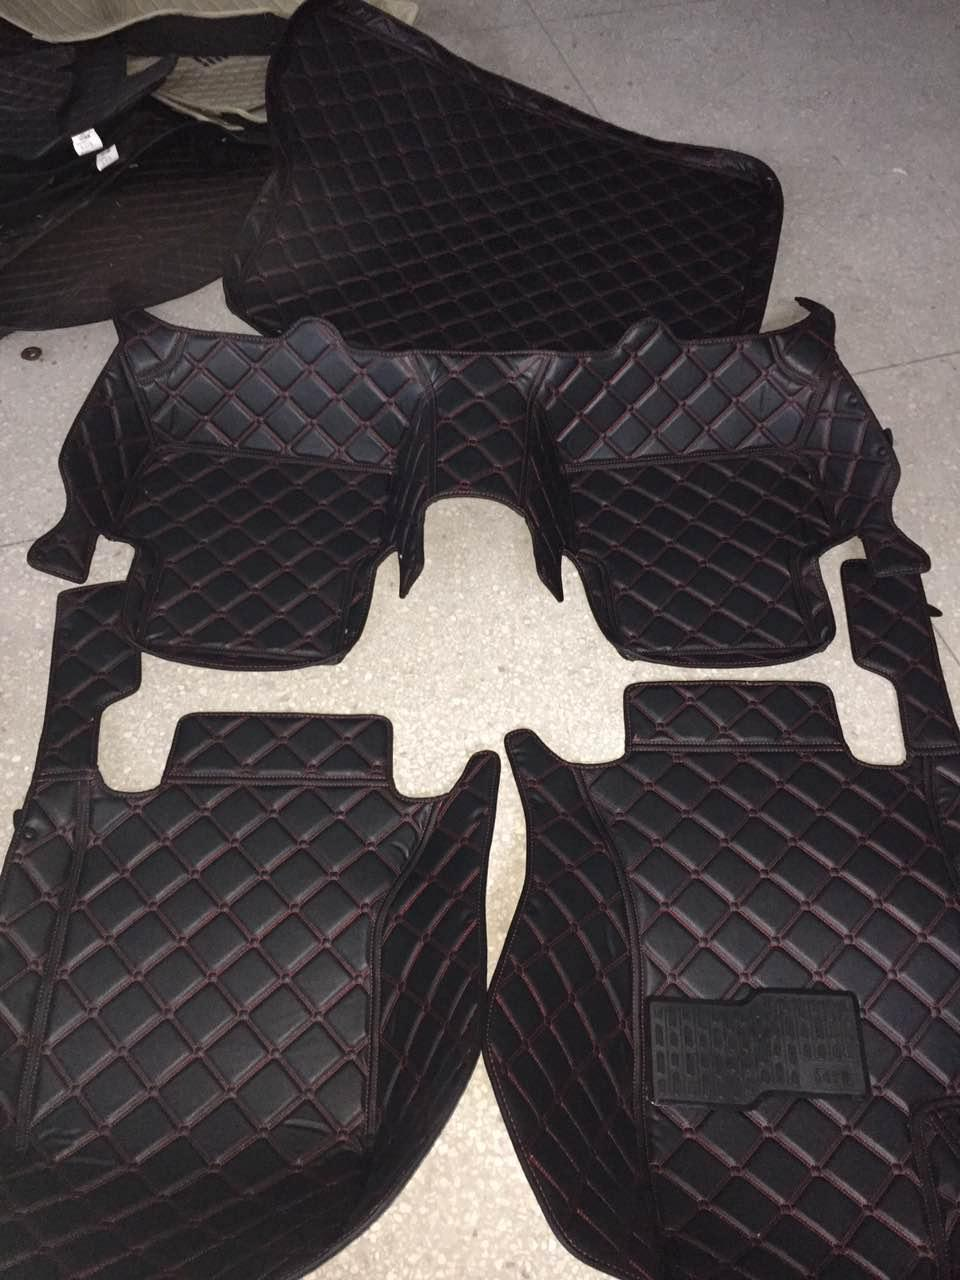 Floor mats mercedes - 5d Leather Xpe Car Floor Mats For Mercedes Benz Amg Cla 45 Shooting Brake Orangeart Edition